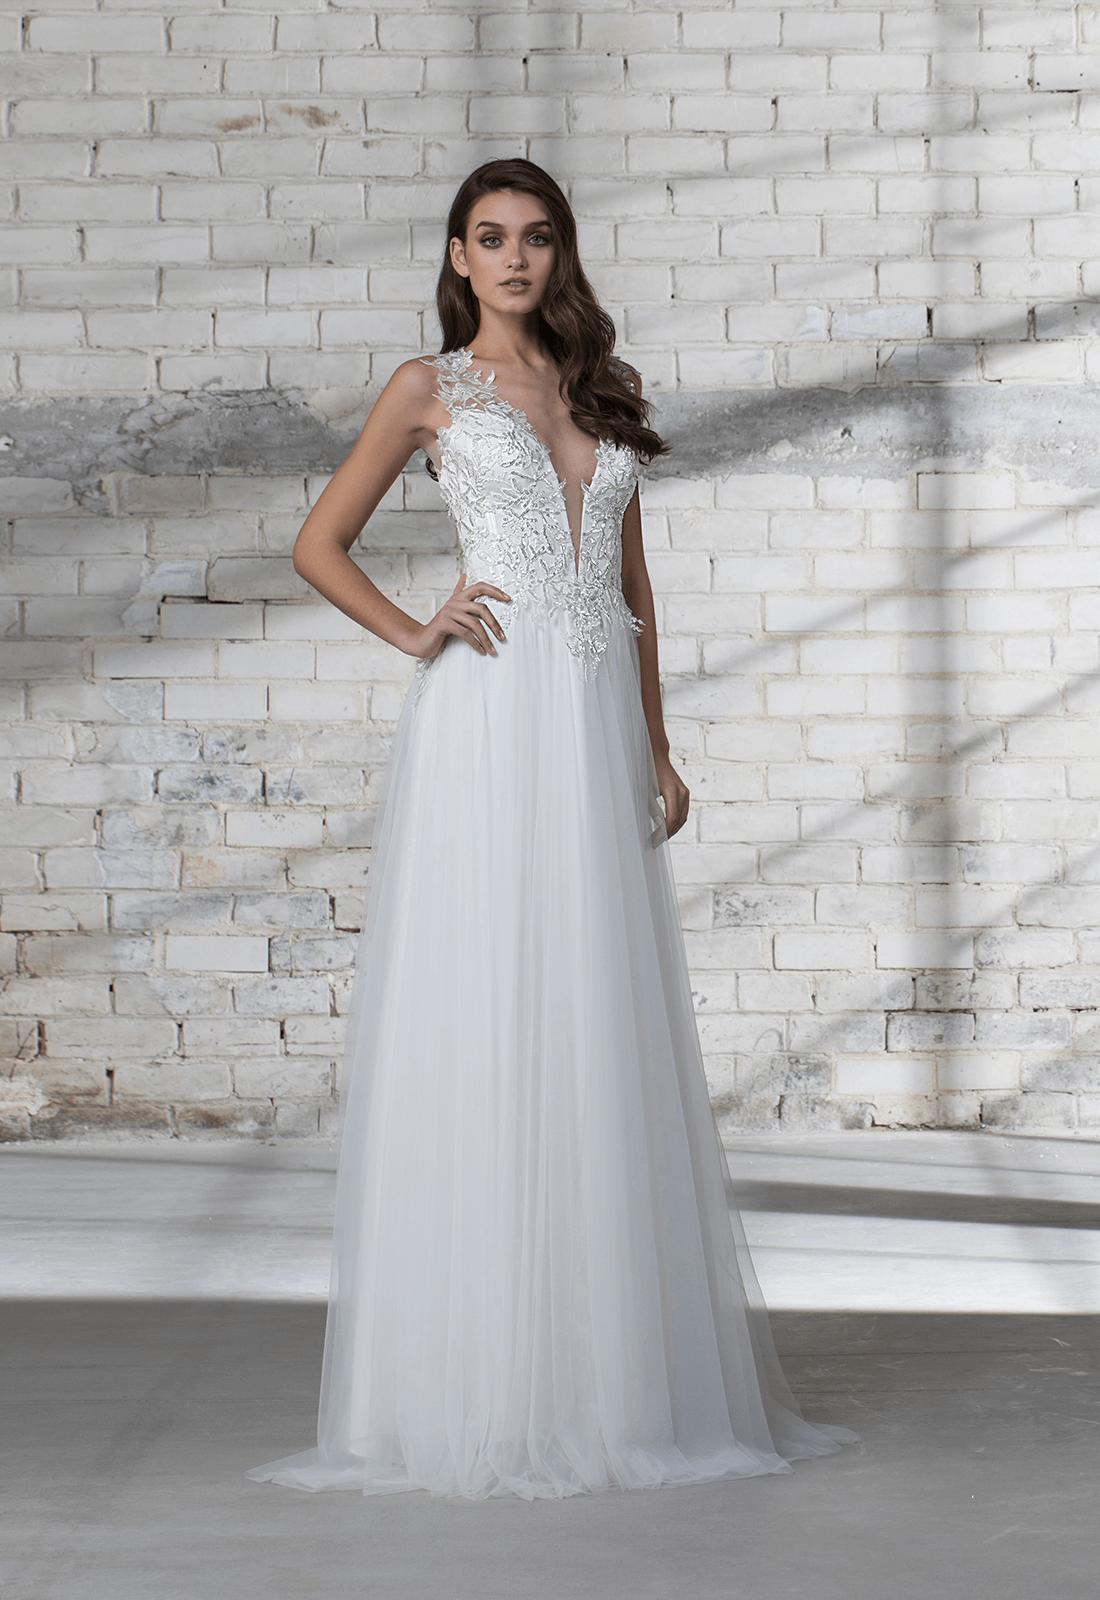 Sleeveless Aline Tulle Skirt With Corset Bodice Wedding